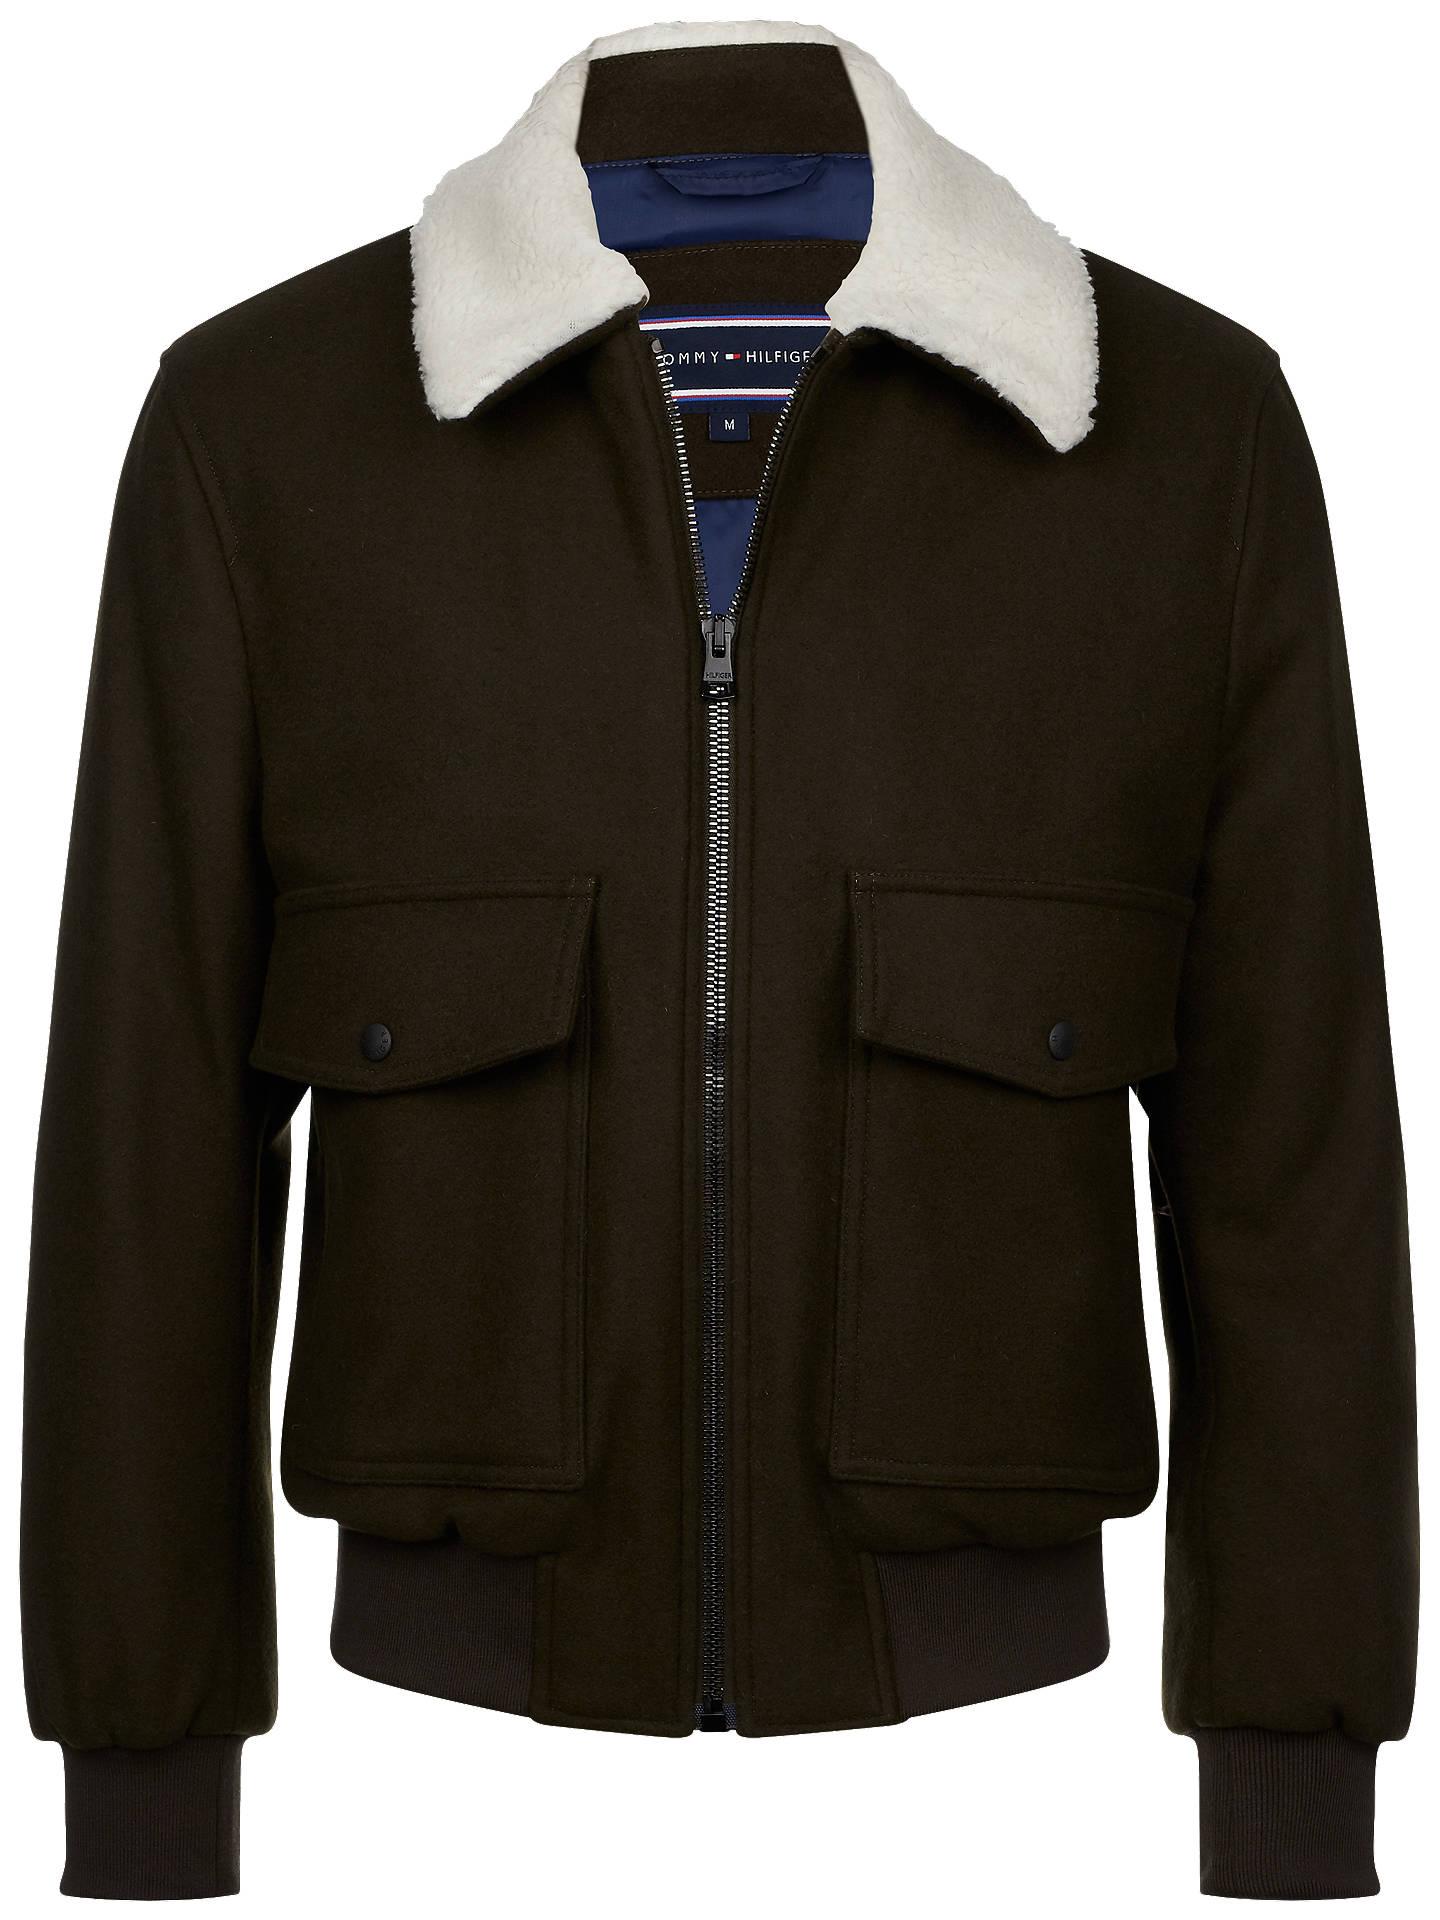 125e099b ... Buy Tommy Hilfiger Melton Wool Bomber Jacket, Rosin, XL Online at  johnlewis.com ...